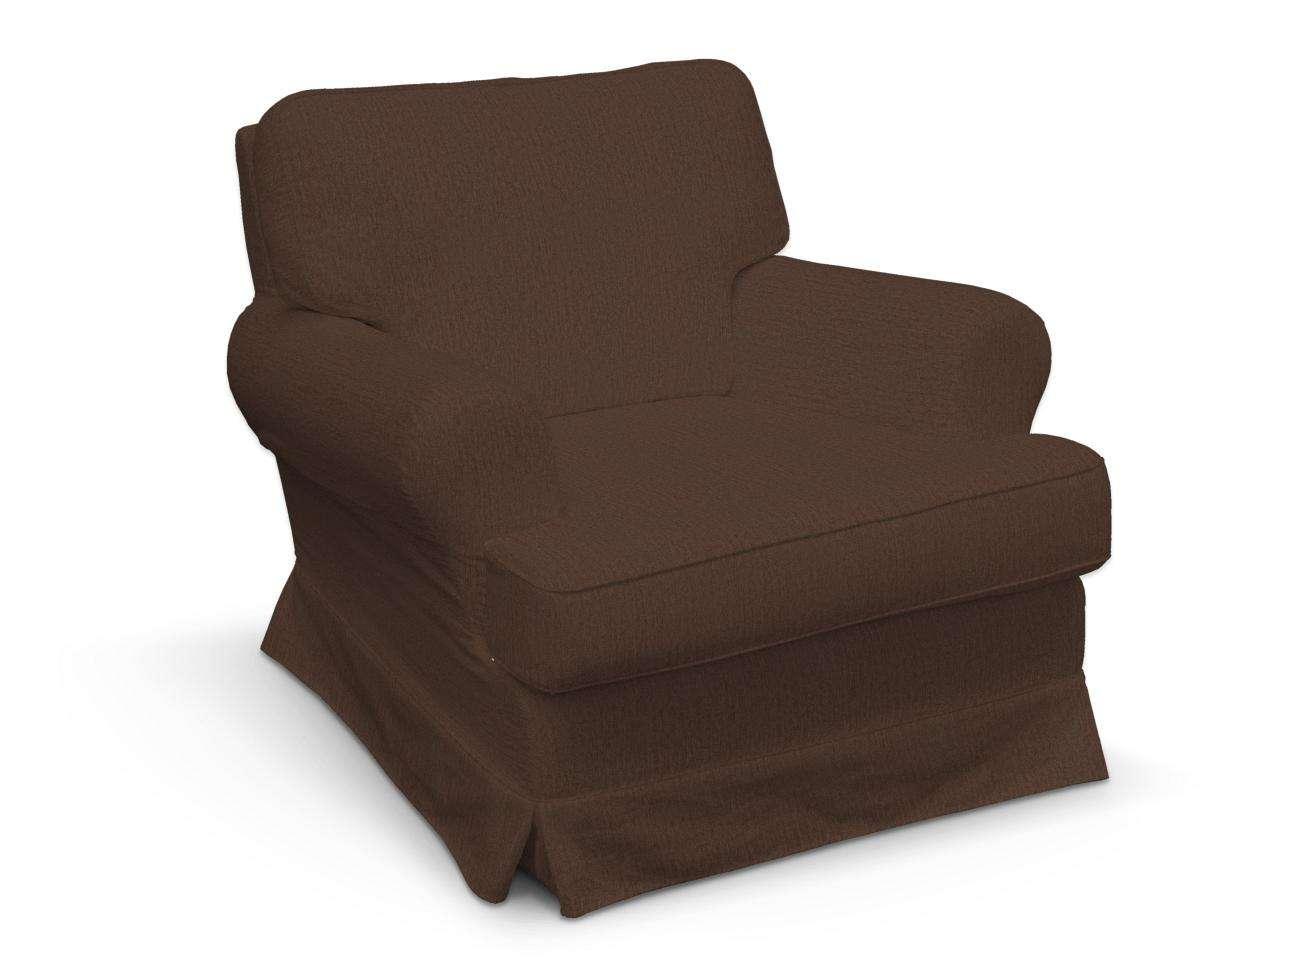 Barkaby Sesselbezug Sessel  Barkaby von der Kollektion Chenille , Stoff: 702-18